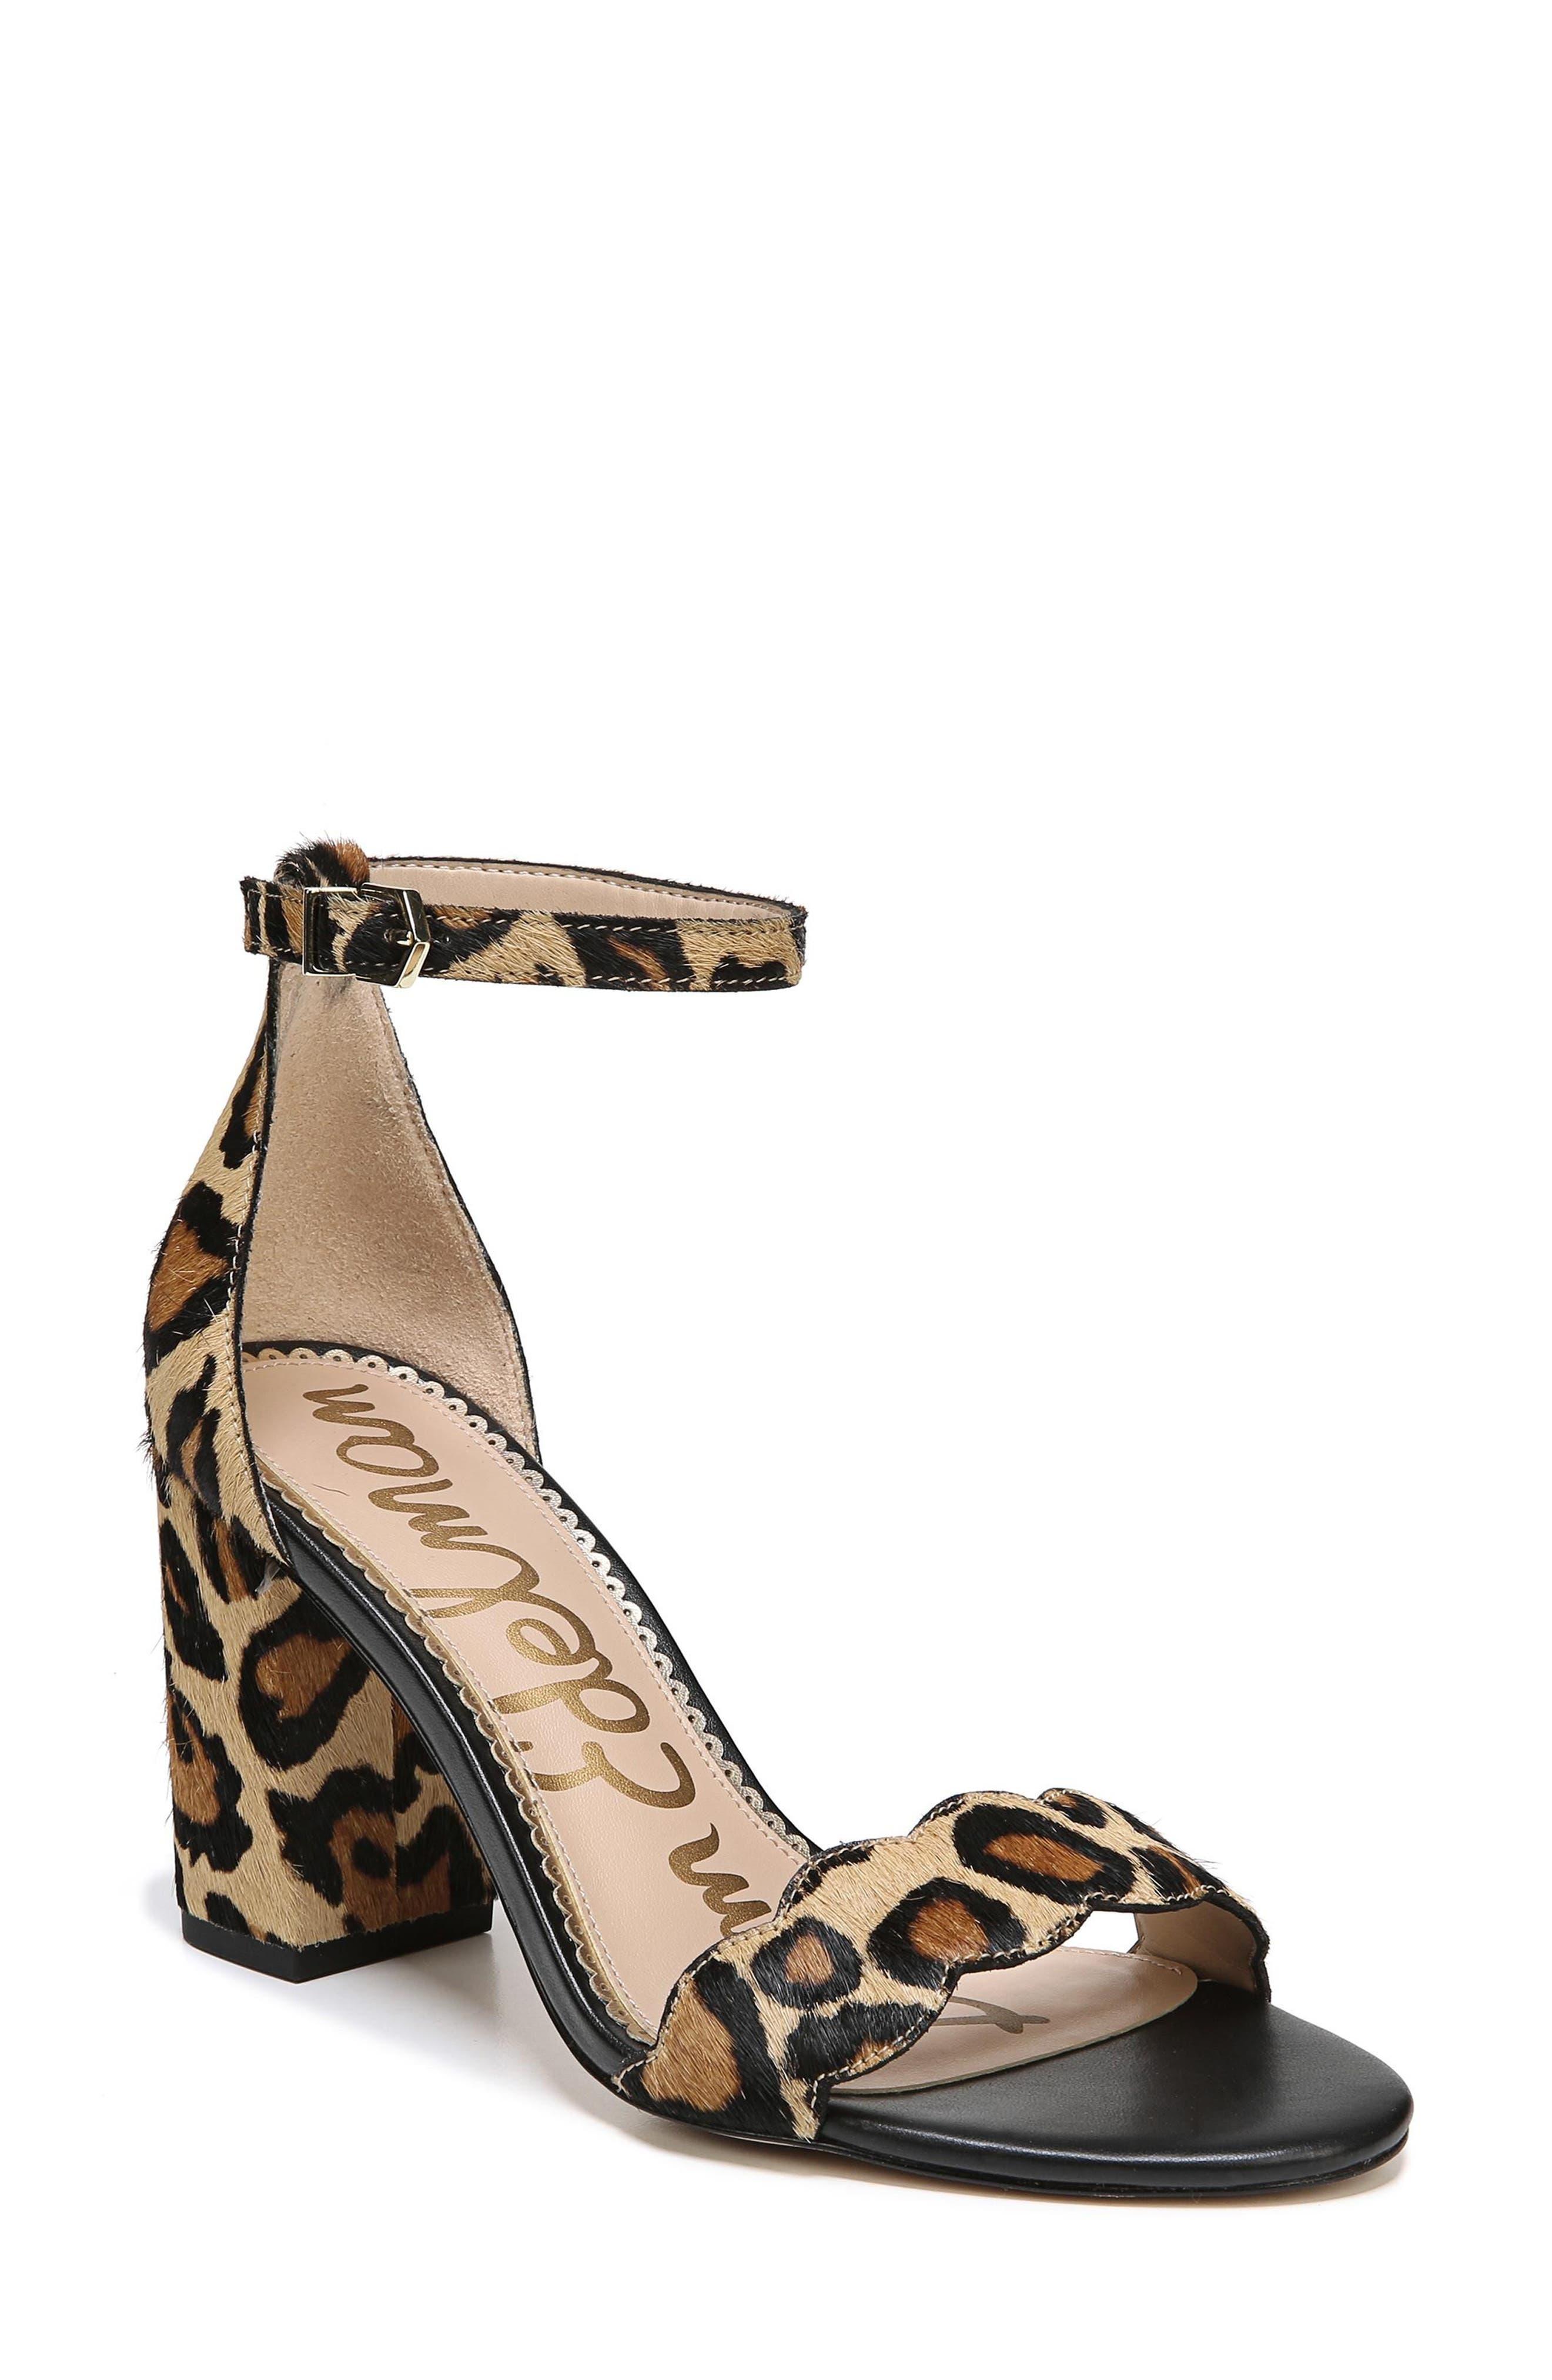 Sam Edelman Women's Odila Genuine Calf Hair Sandal 4rd52S